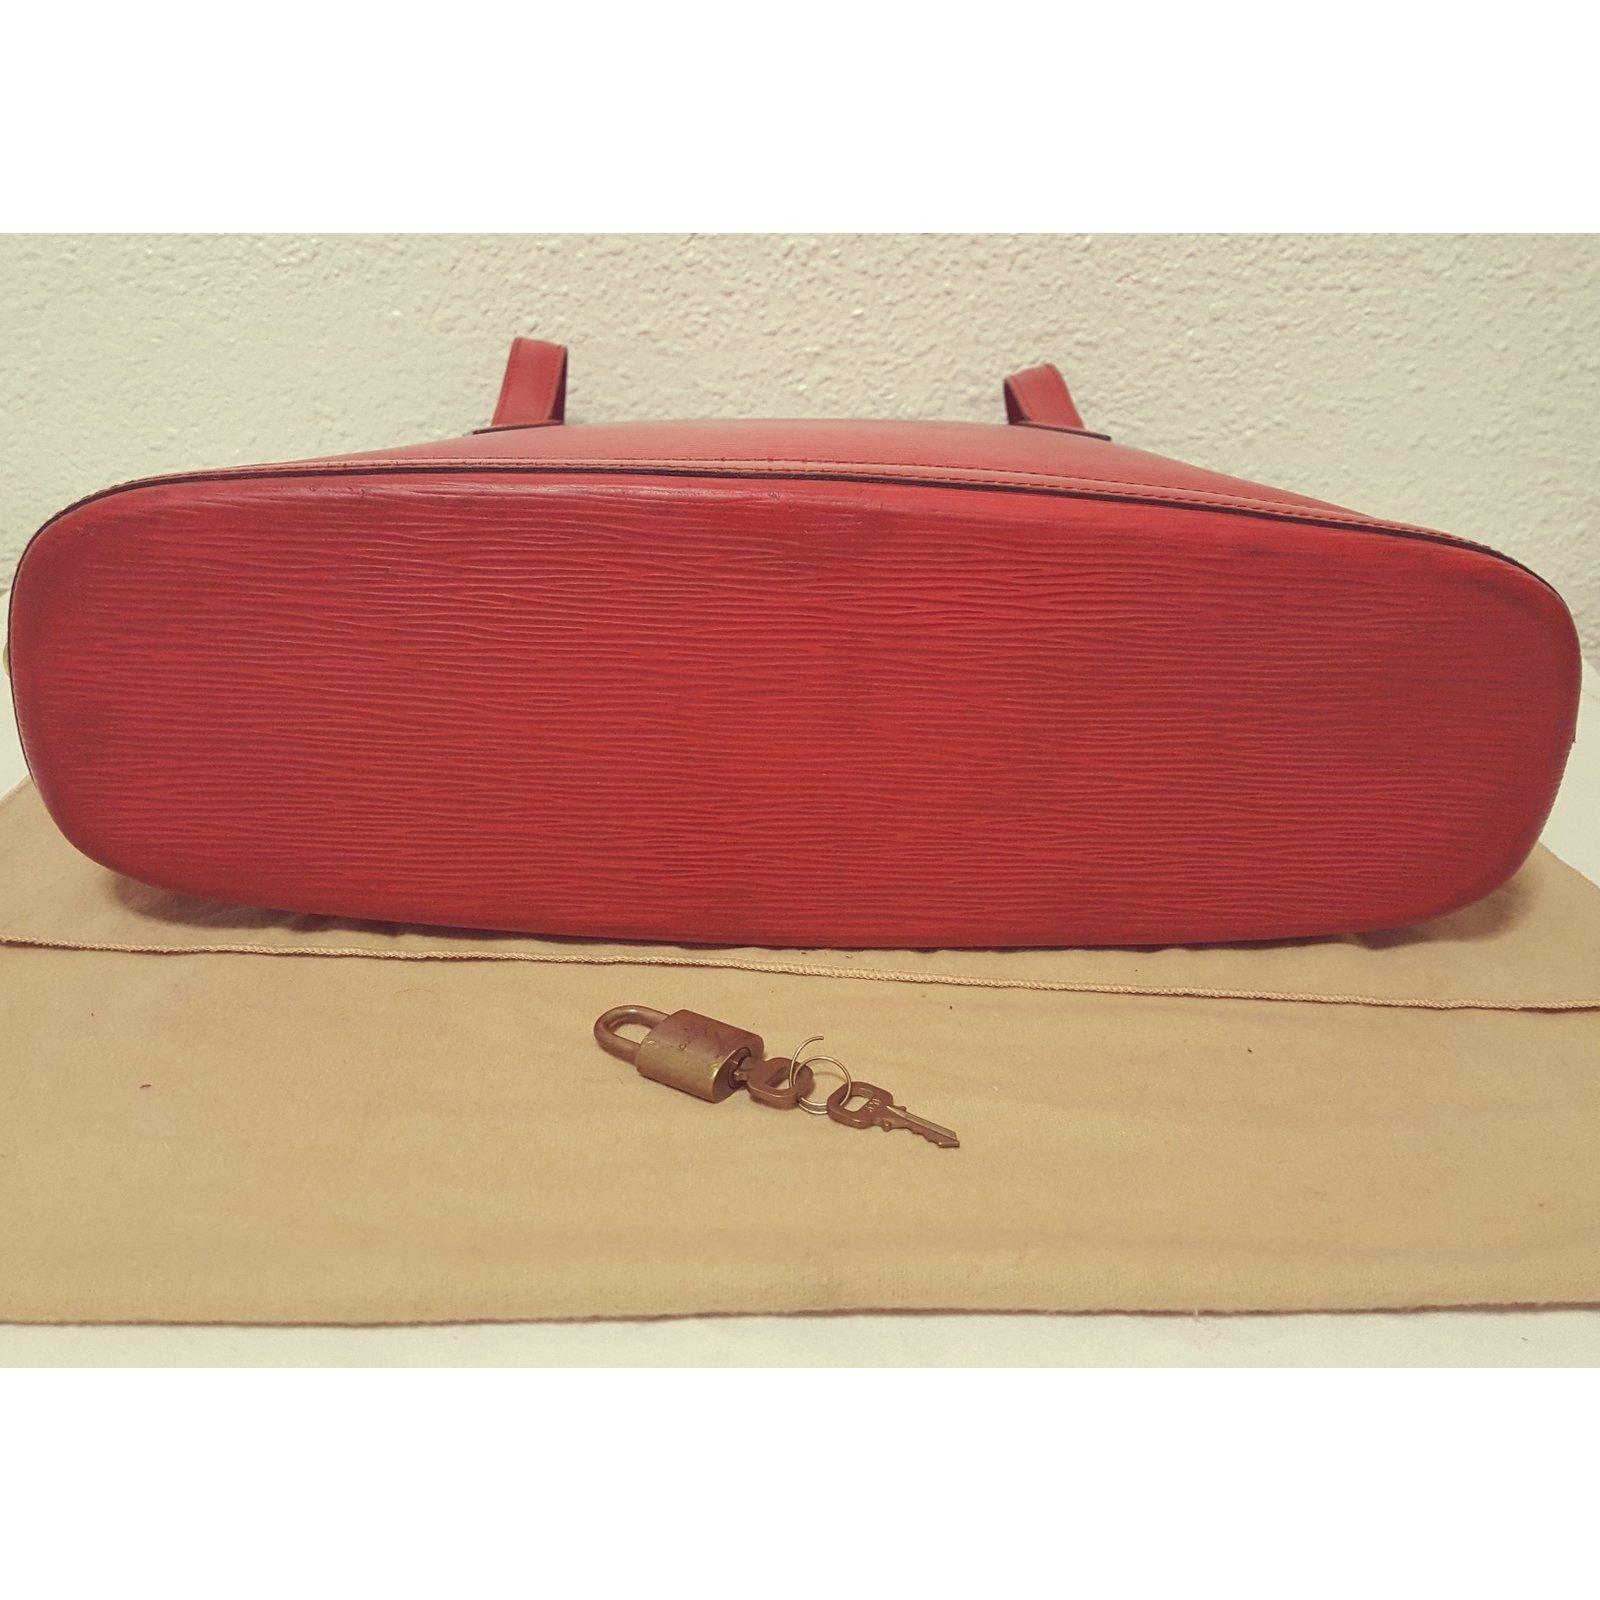 9941391d2d43 Louis Vuitton Handbag Handbags Leather Red ref.33893 - Joli Closet